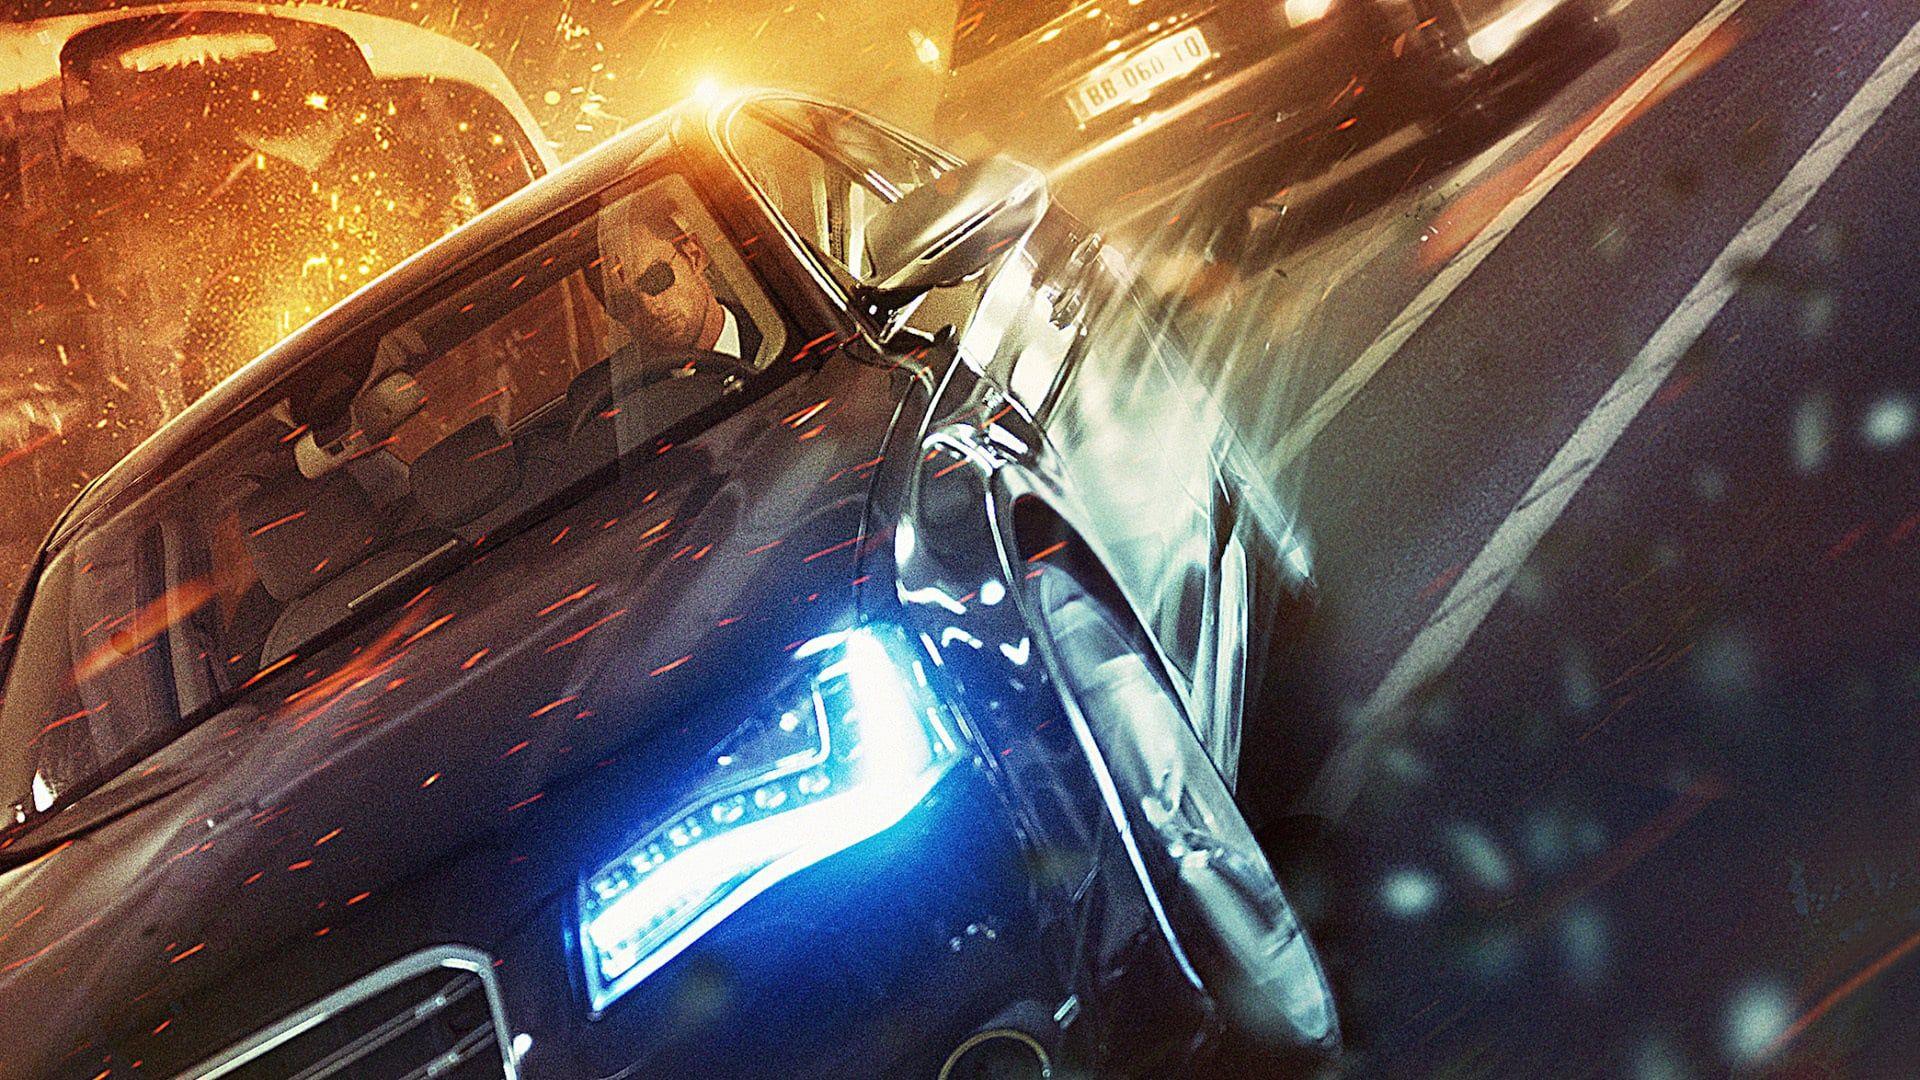 A Szallito Orokseg 2015 Online Teljes Film Filmek Magyarul Letoltes Hd Frank Martin A Legjobban The Transporter Refueled Streaming Movies Online Movies Online